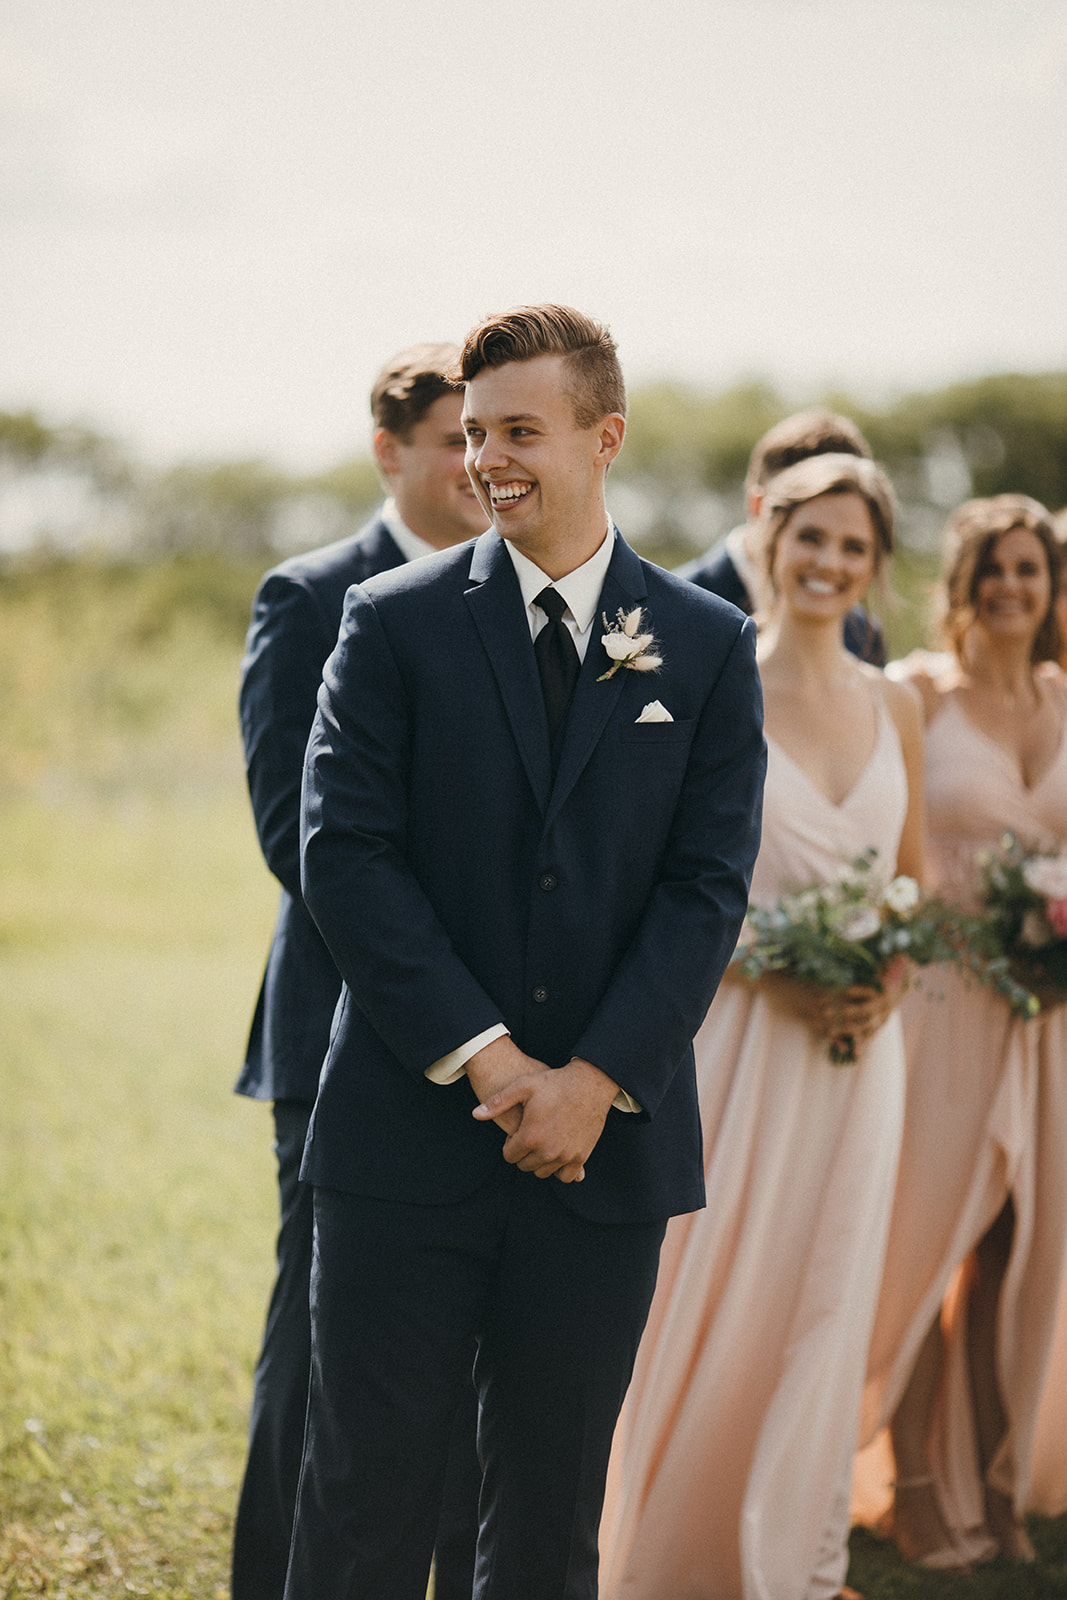 kaden_justine_wedding_3559.jpg